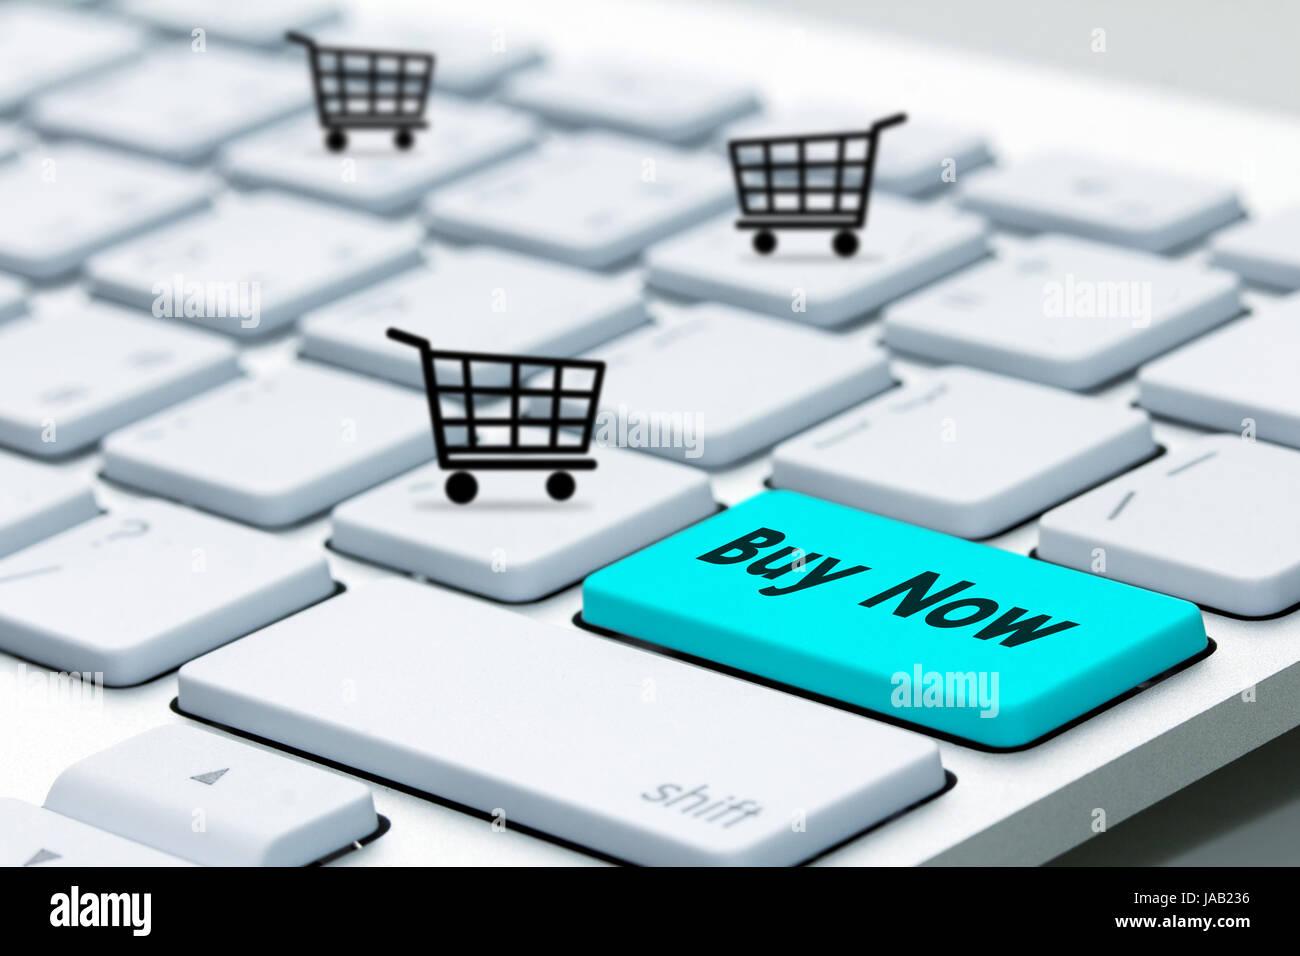 keyboard buy now icon - Stock Image